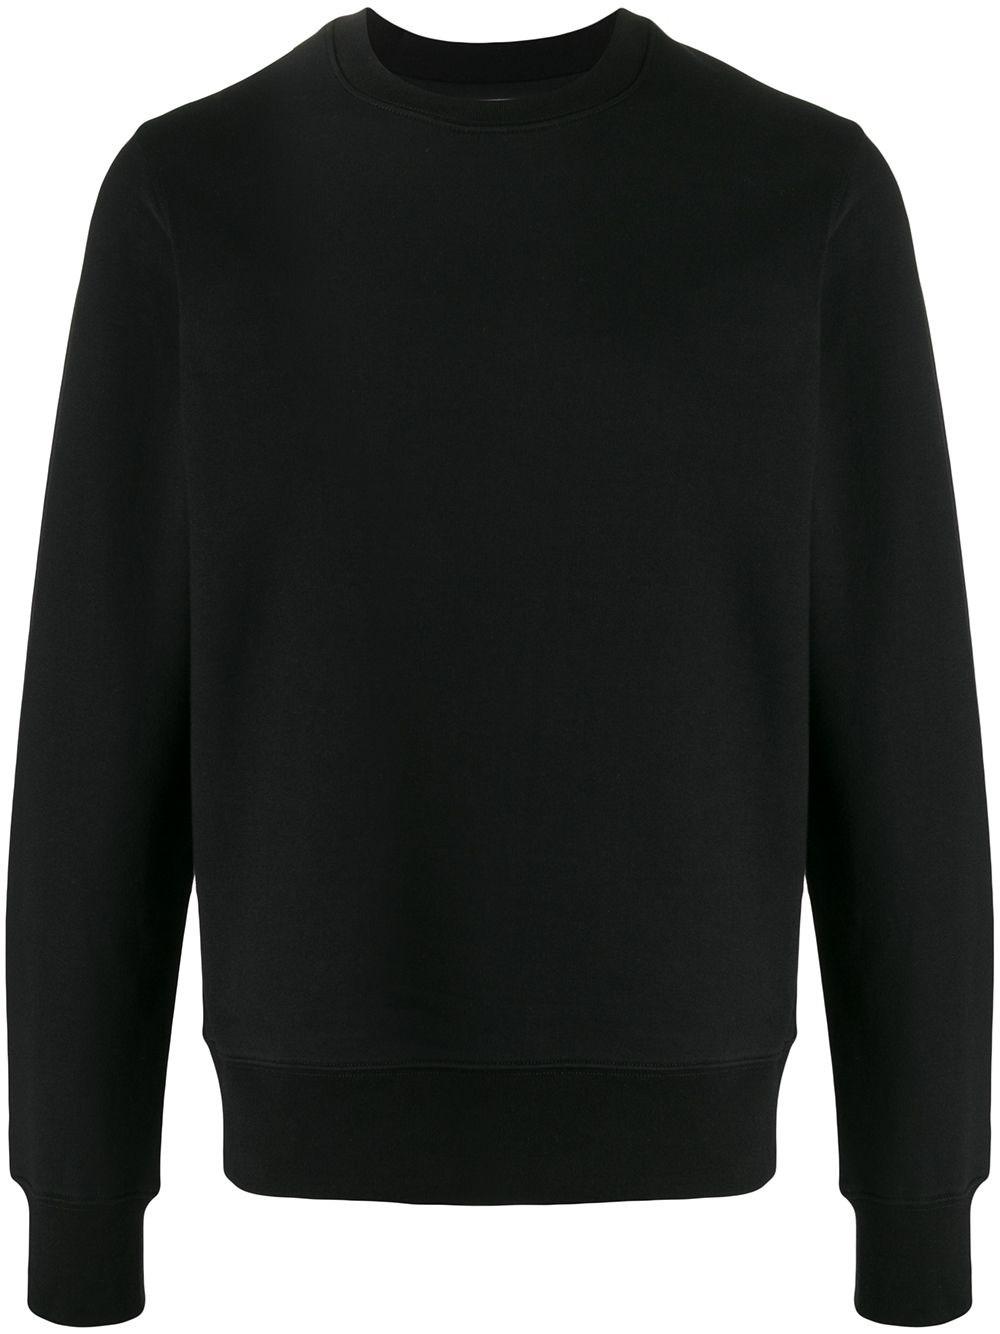 ADIDAS Y-3 Black Sweatshirt